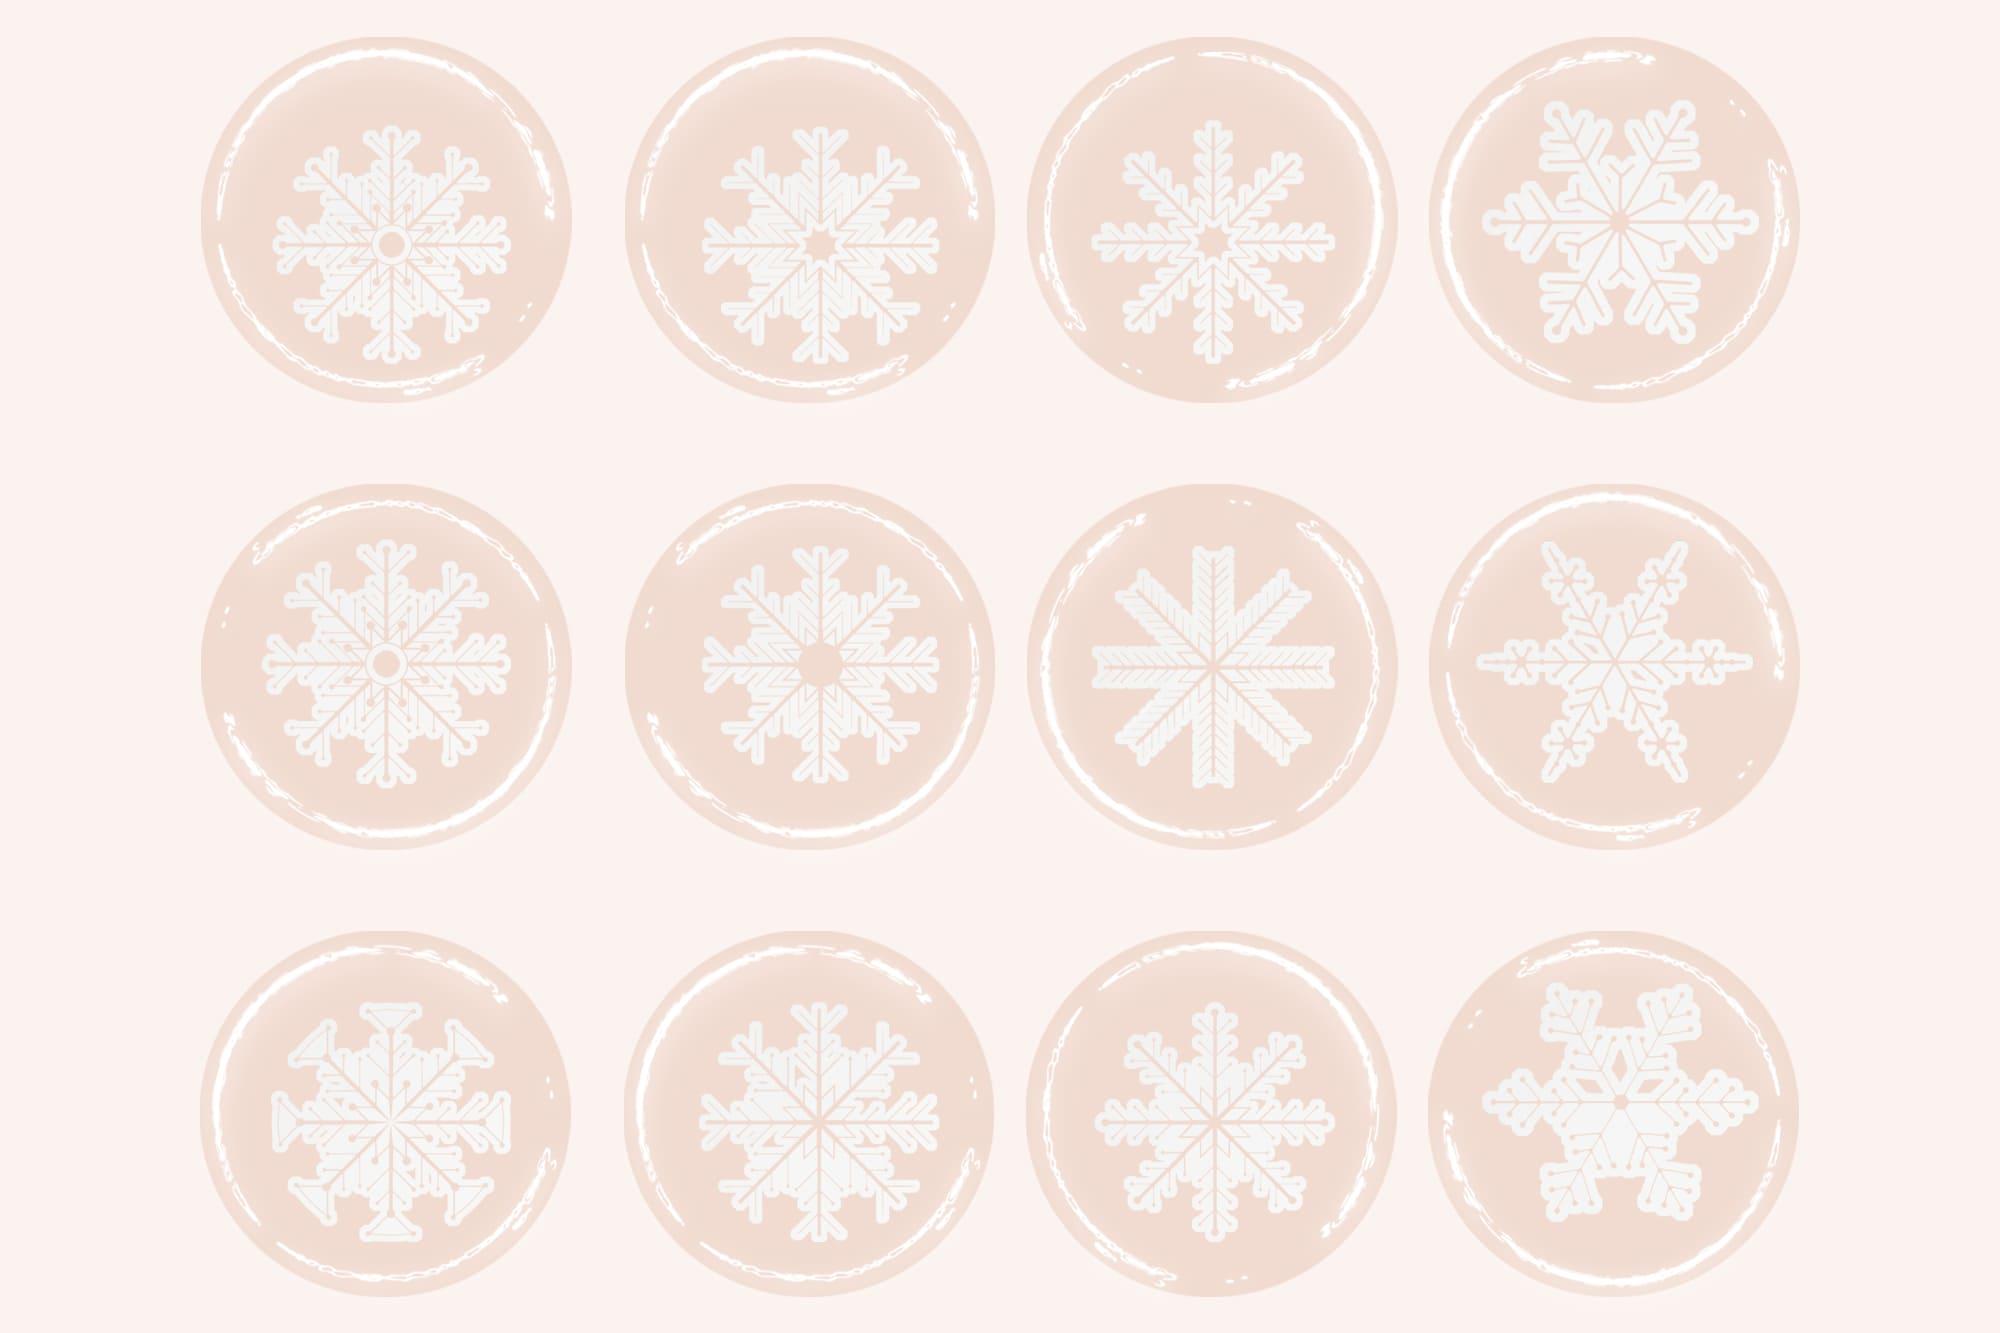 496 Christmas Illustrations: Christmas Vectors Bundle SVG, EPS, AI - Snowflakes 3d